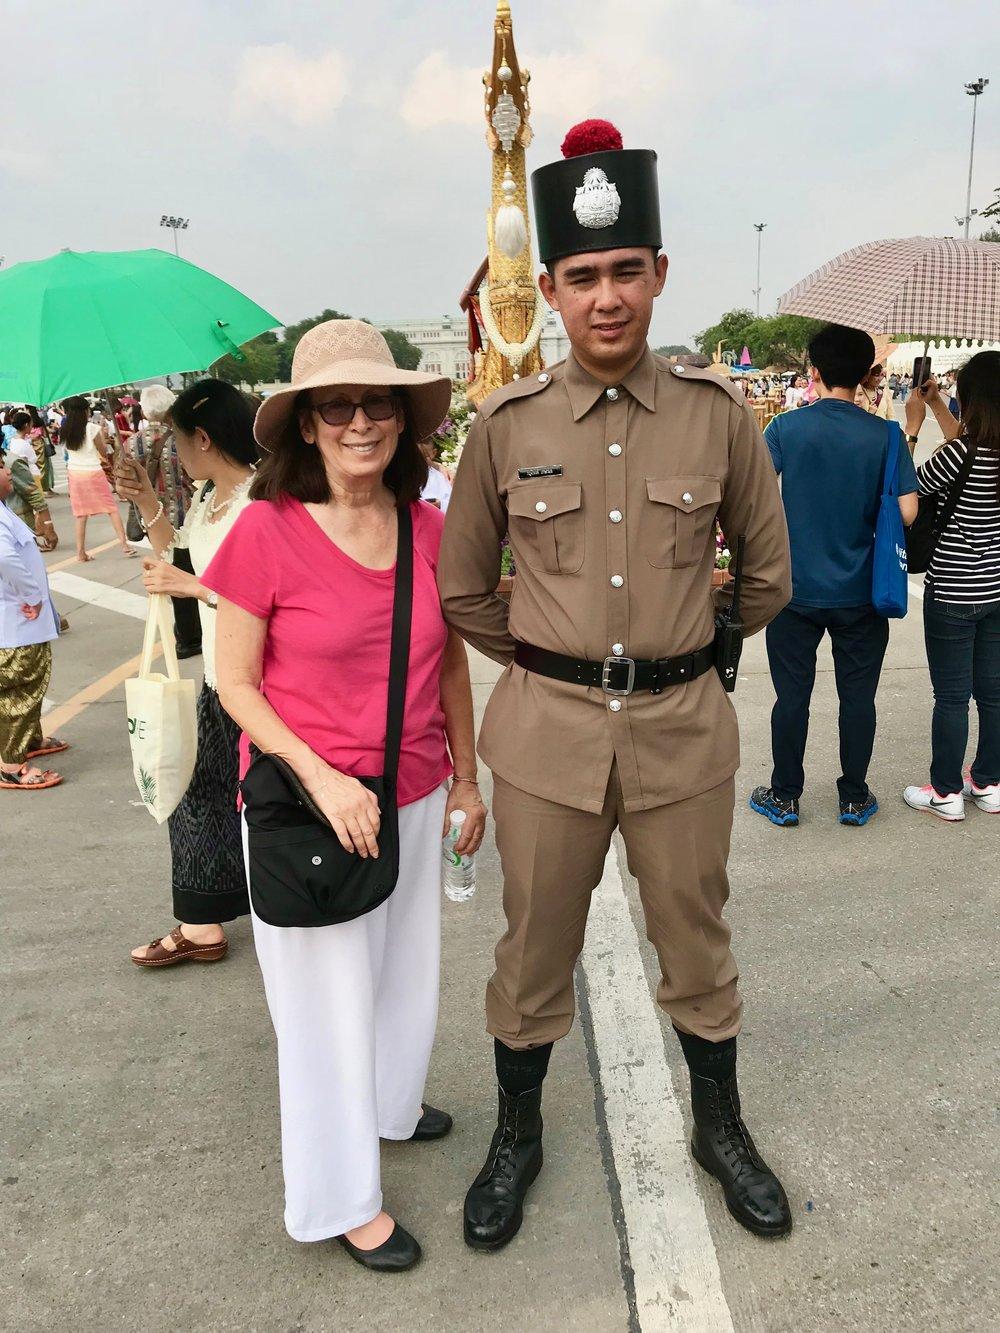 Cecile and Policeman.jpg*.jpg